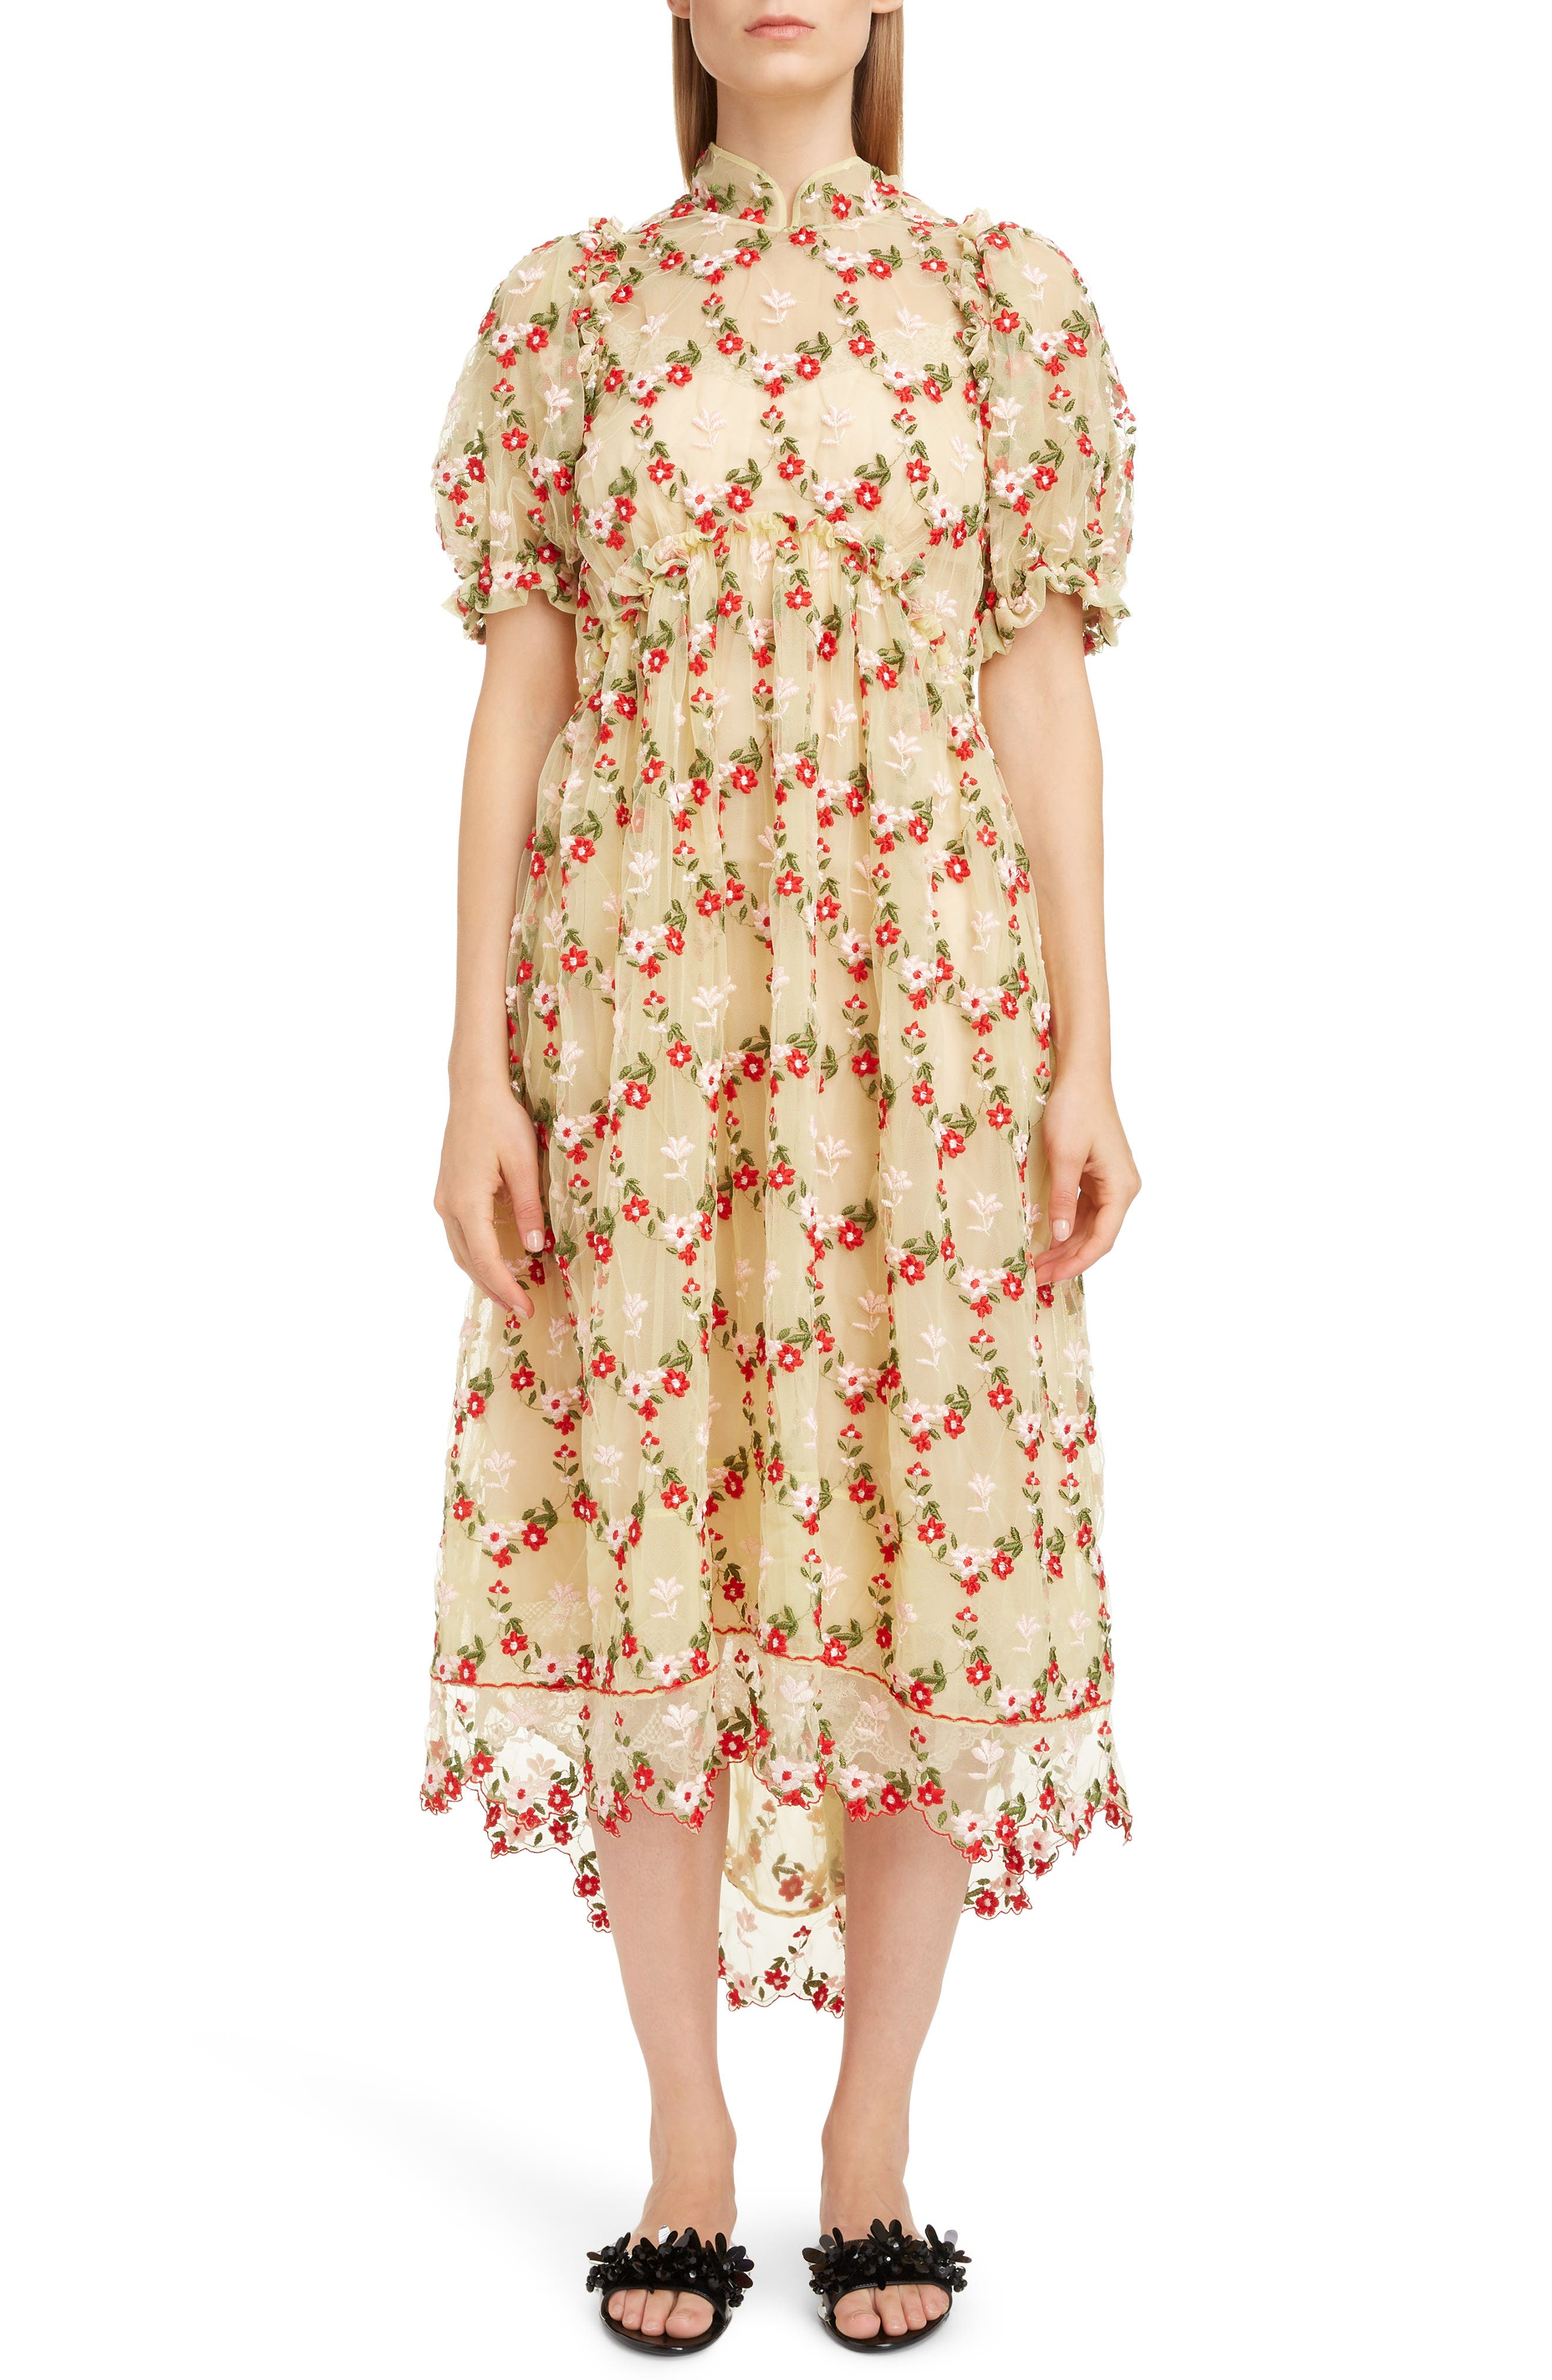 ae50c34aea08 Buy simone rocha dresses for women - Best women's simone rocha dresses shop  - Cools.com